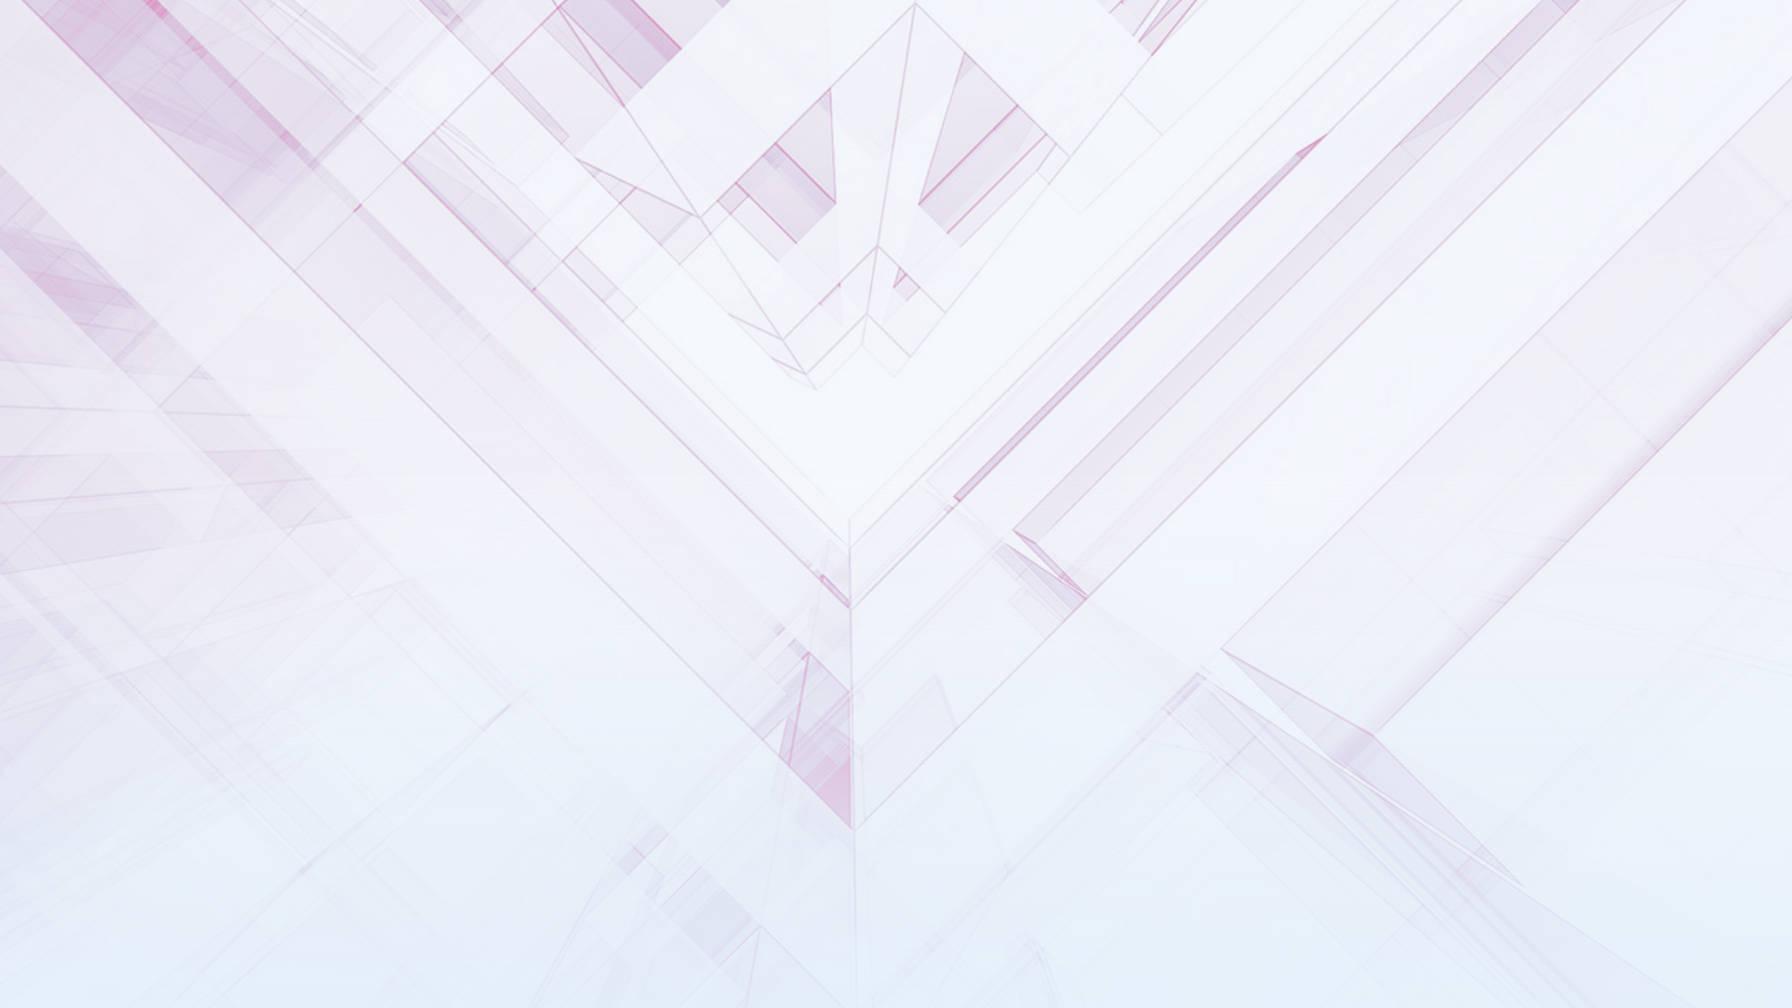 virtual-wordpress-page-builder-summit-kicks-off-october-5虚拟WordPress Page Builder峰会于10月5日启动